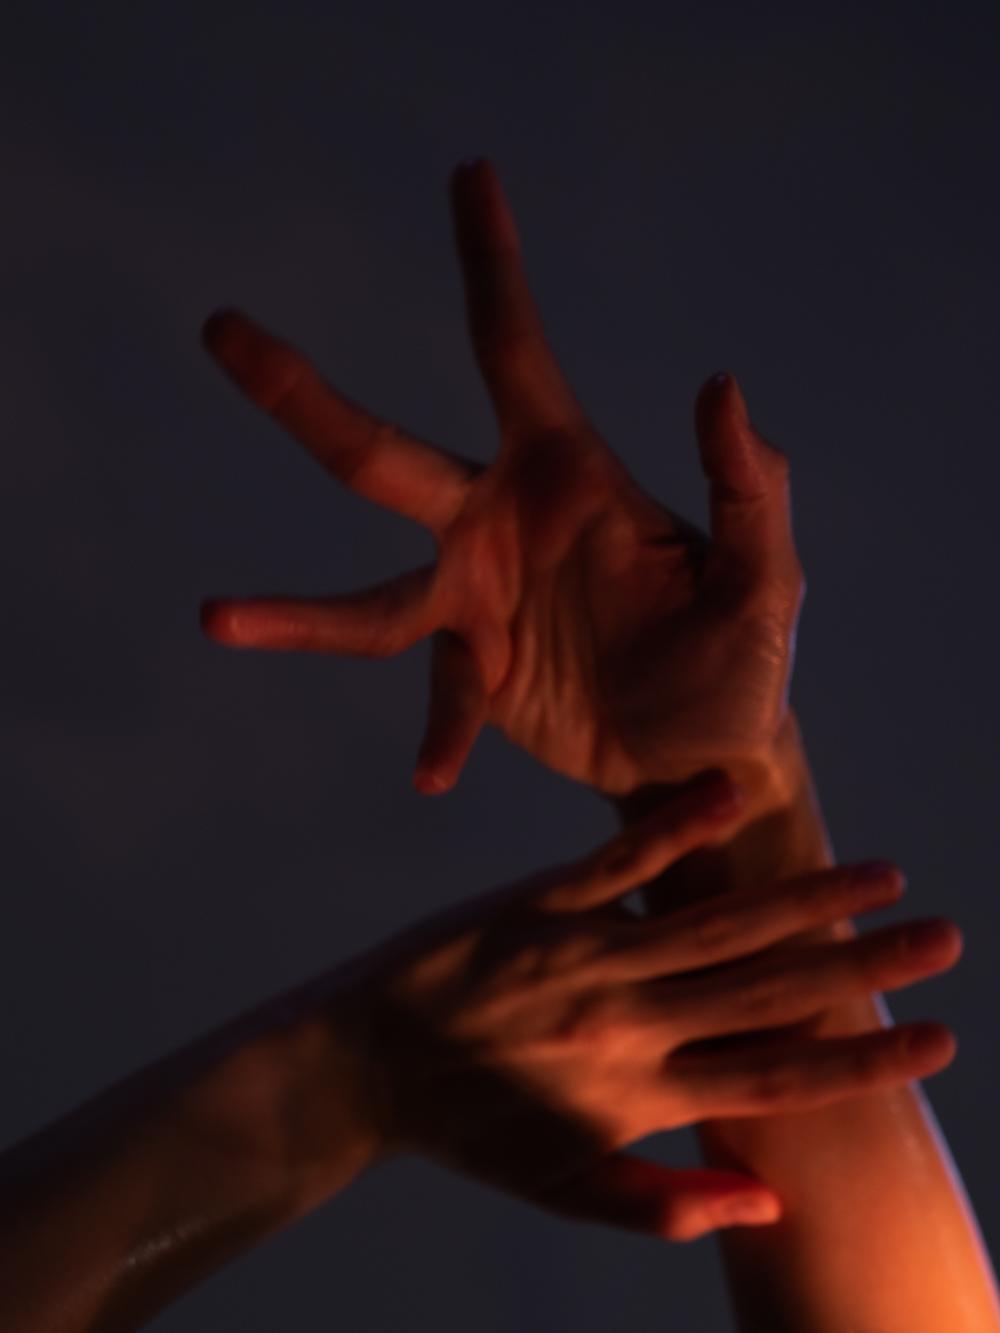 Ближе к телу: специальная съемка Louis Vuitton x BURO. (фото 5)